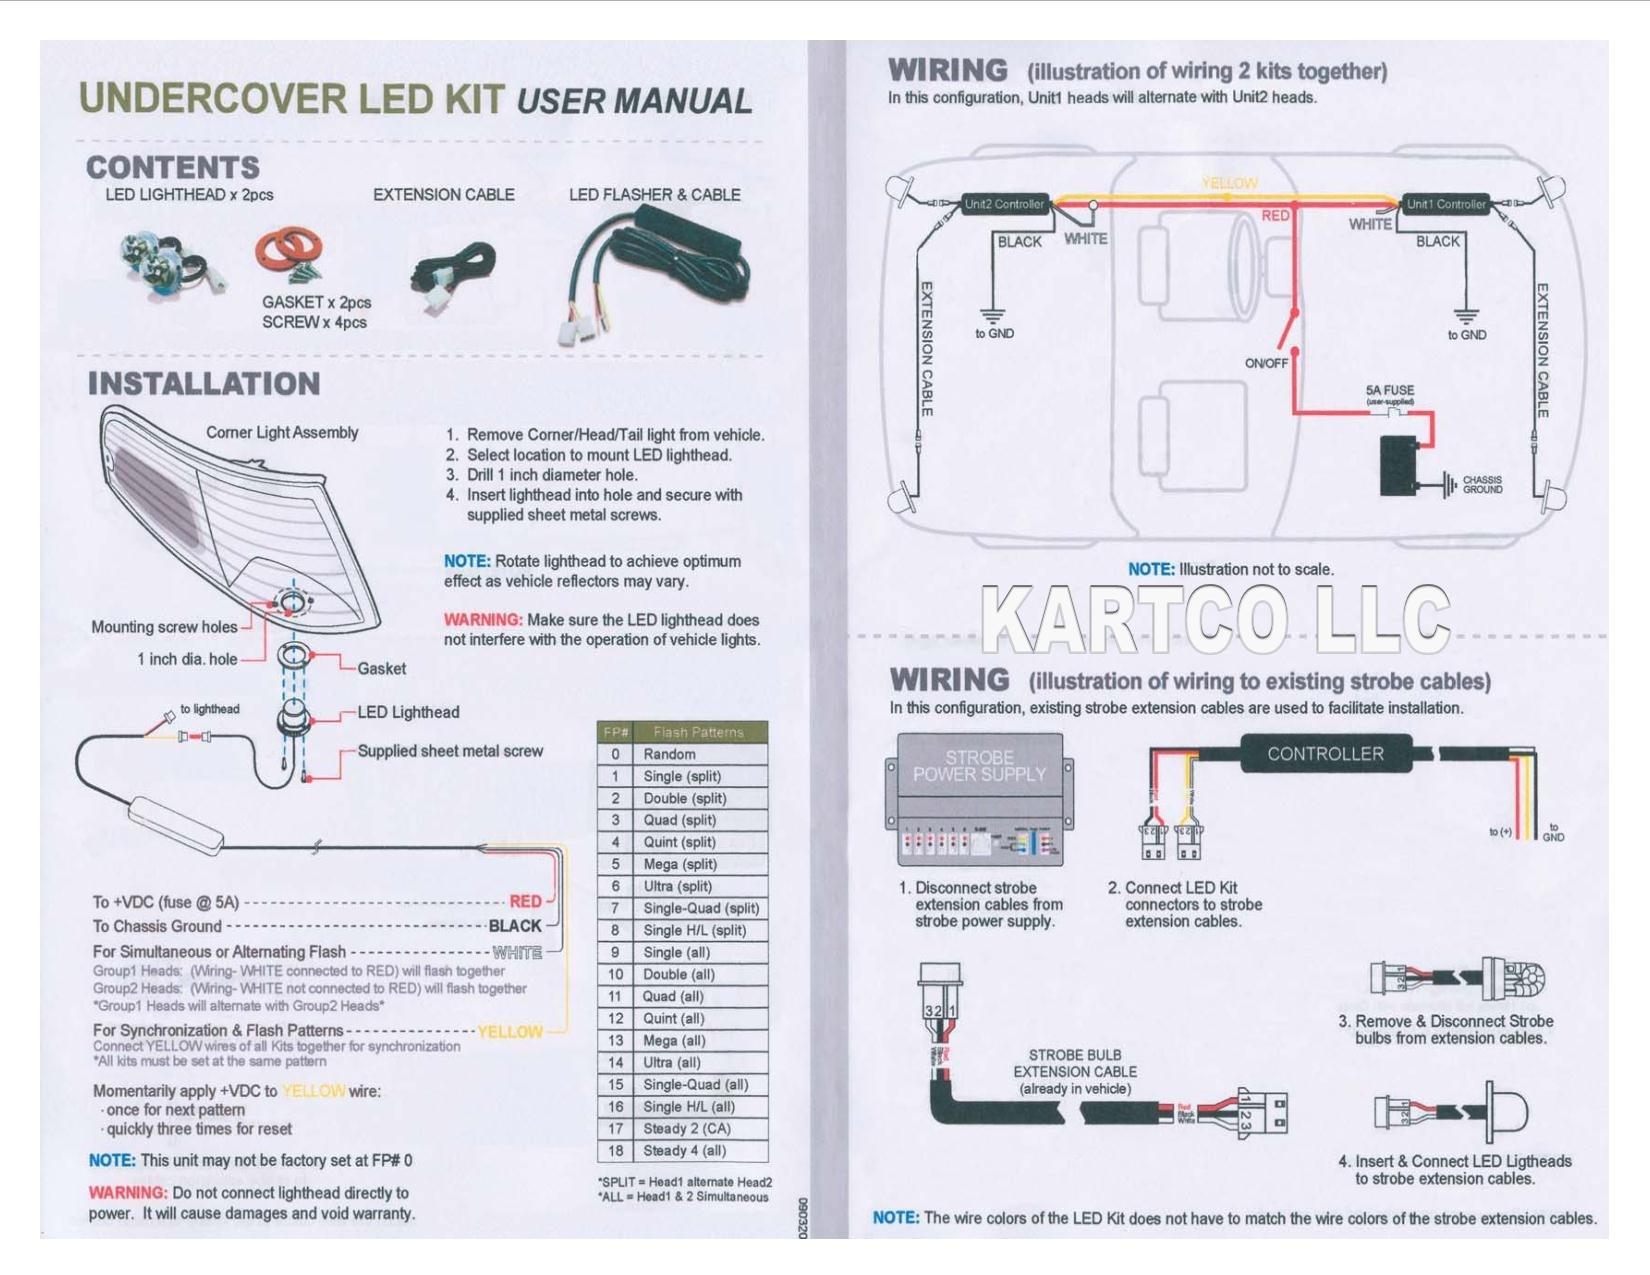 HR_2325] Strobe Power Supply Wiring Diagram Download DiagramBenol Stica Nnigh Weasi Emba Mohammedshrine Librar Wiring 101